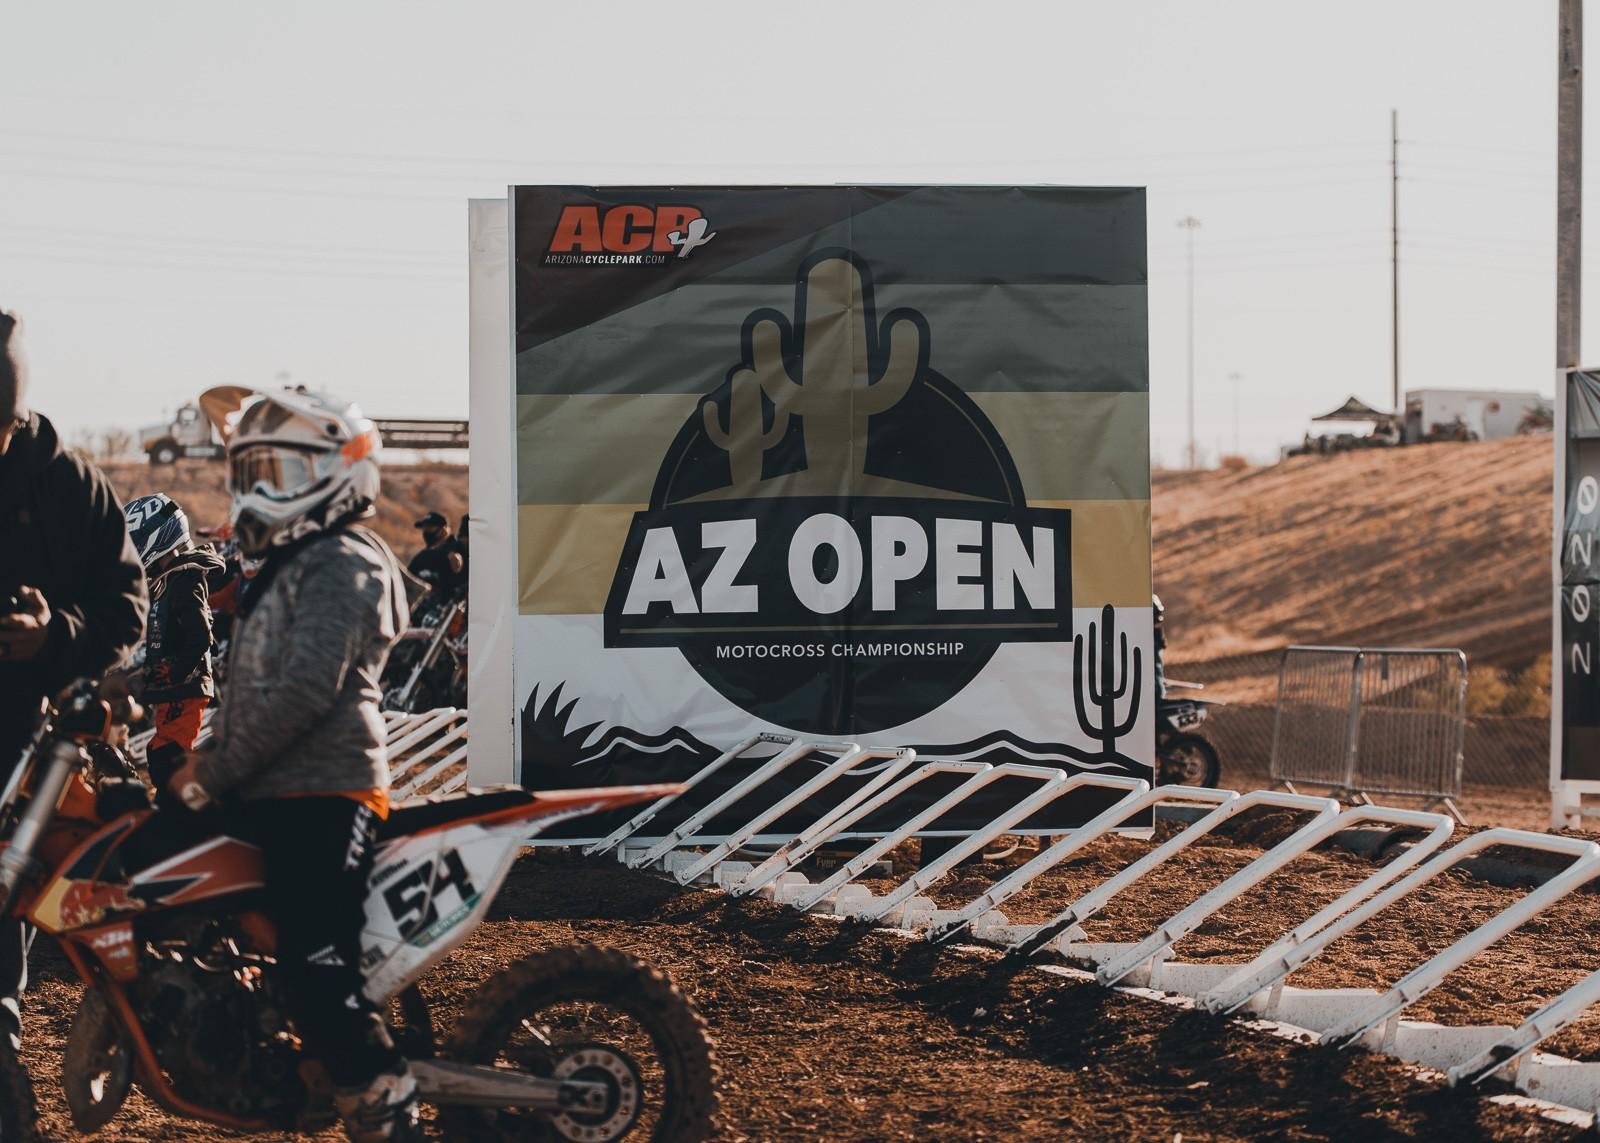 AZ Open Thursday - GuyB - Motocross Pictures - Vital MX